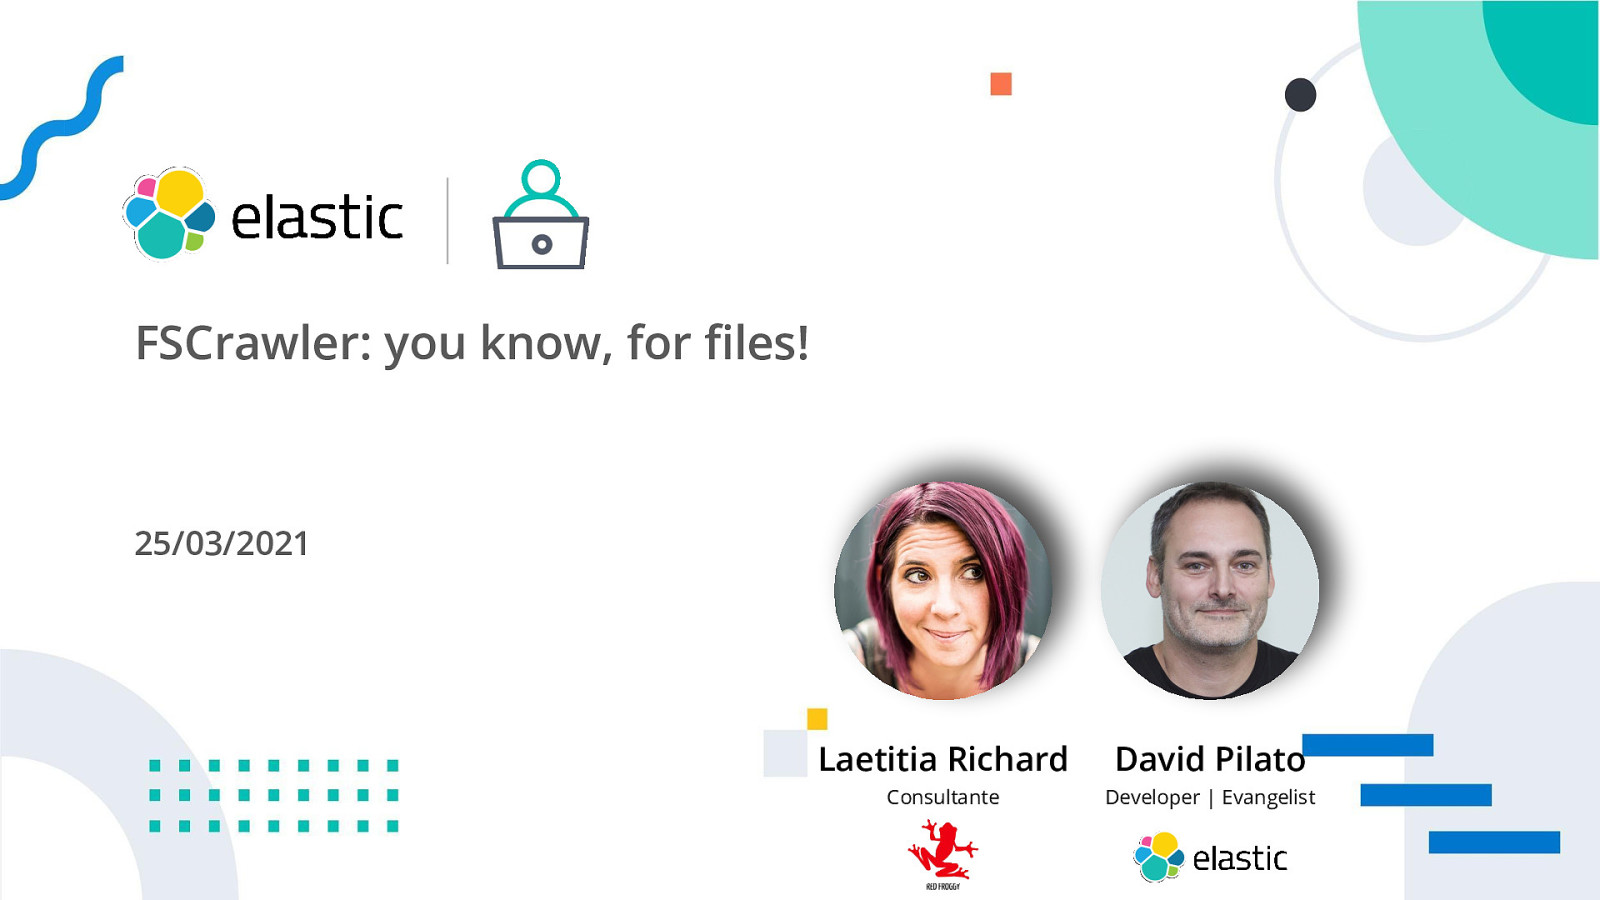 FSCrawler: you know, for files!